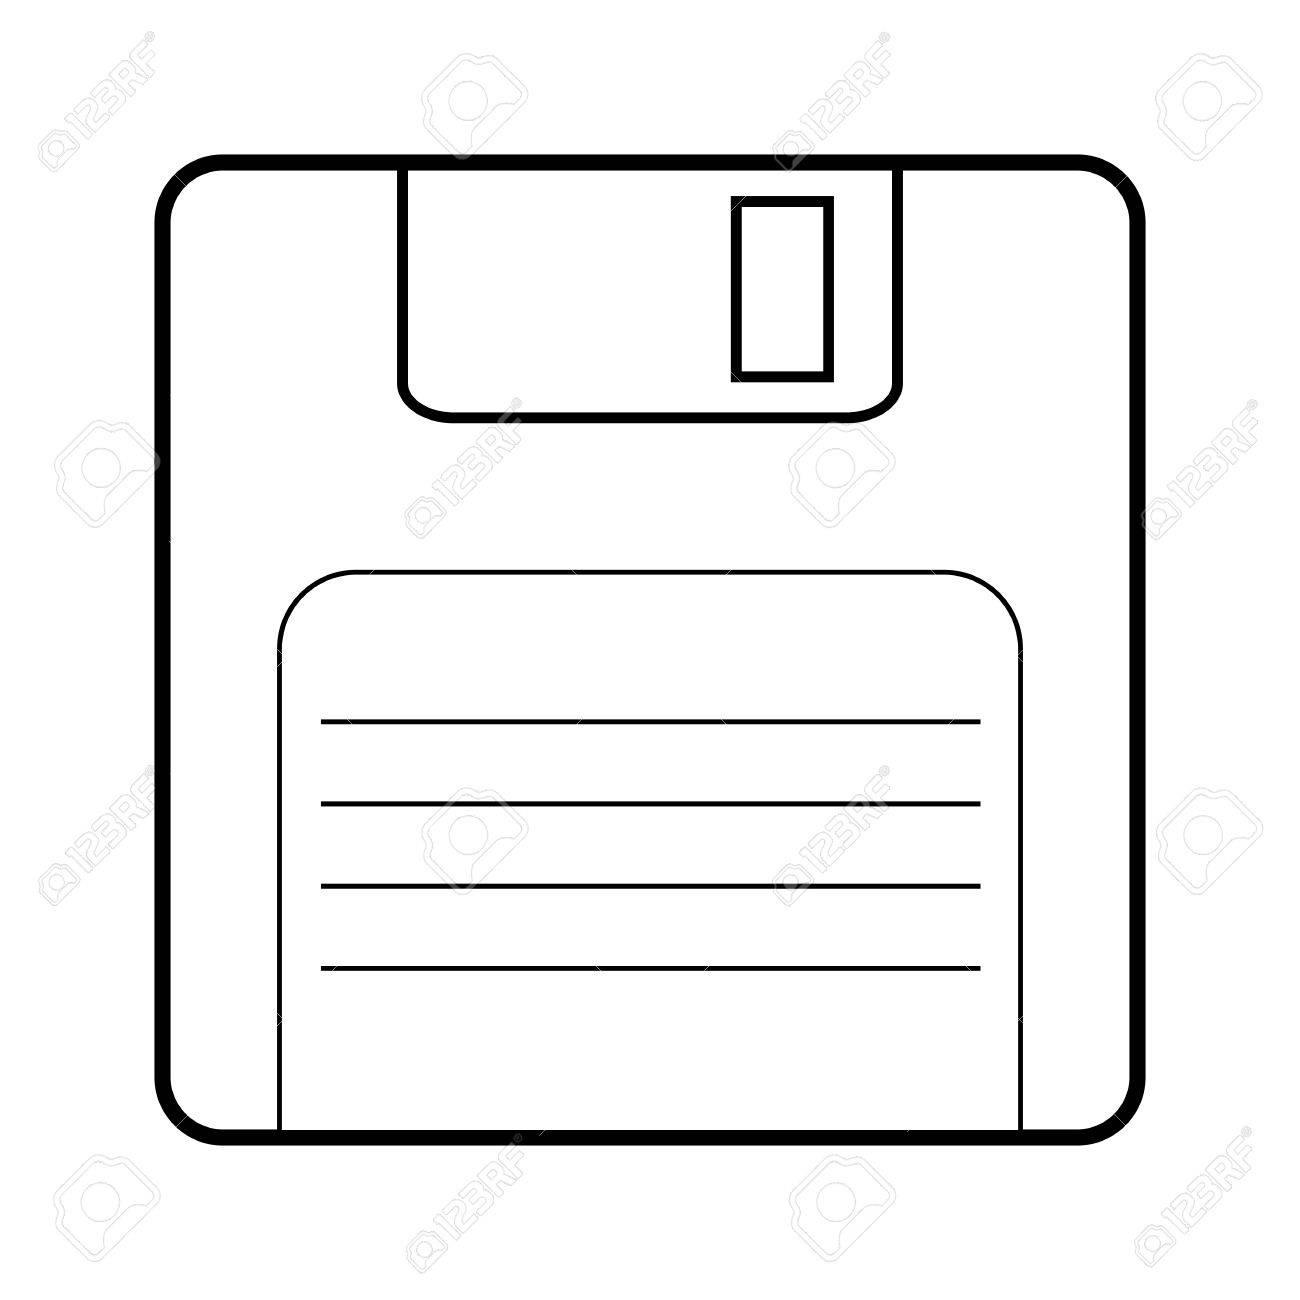 Floppy disk line icon. Vector illustration on white background - 50824934